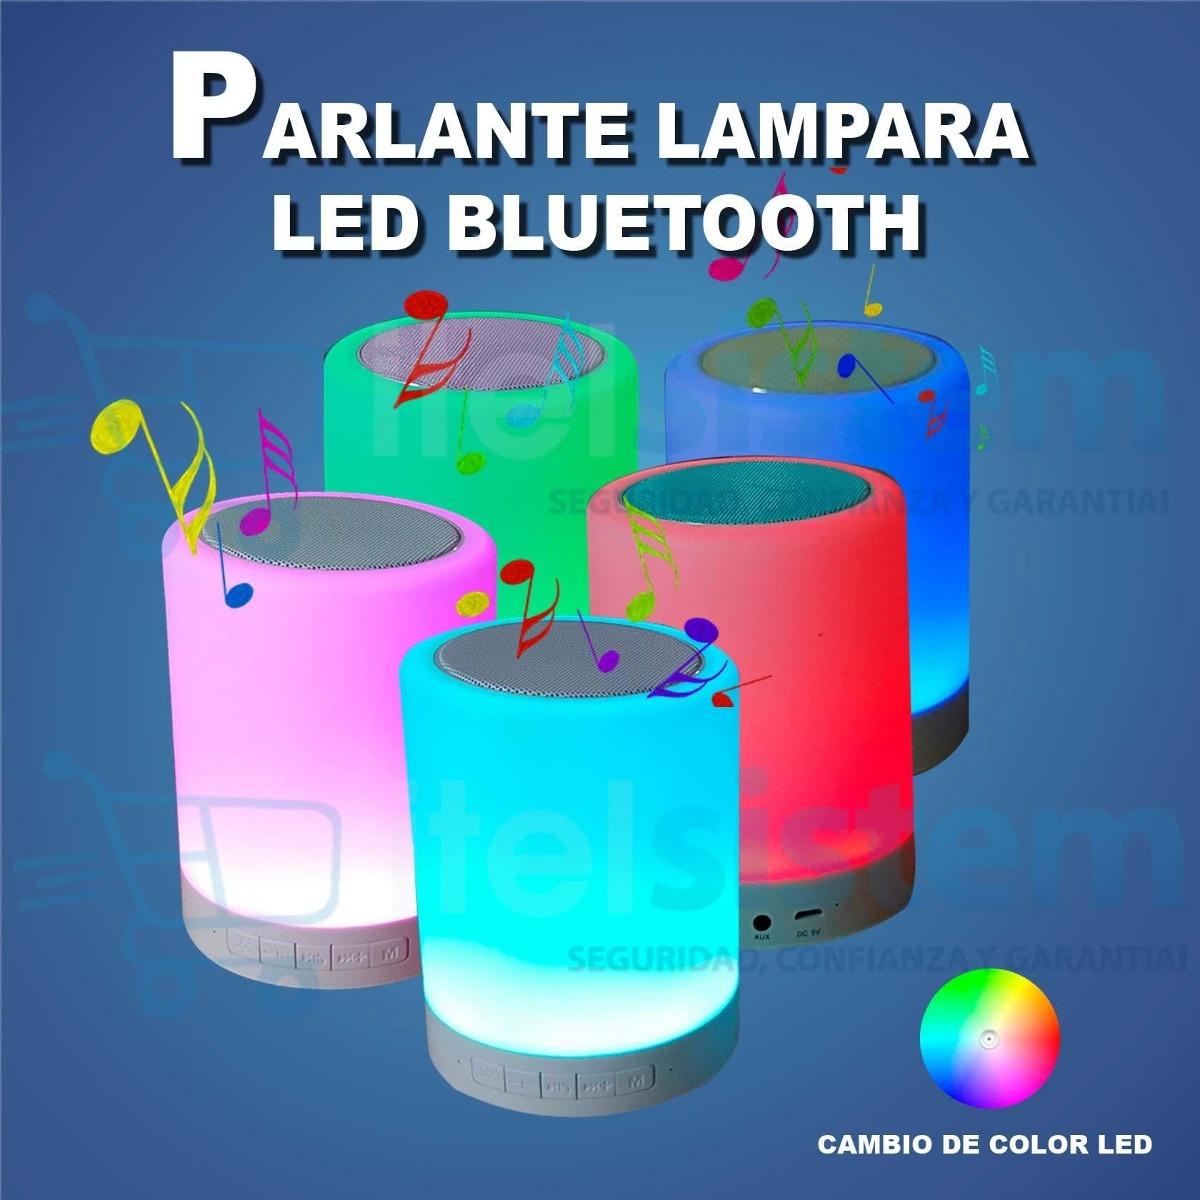 Parlante lampara led bluetooth altavoz 7 colores for Lampara altavoz bluetooth